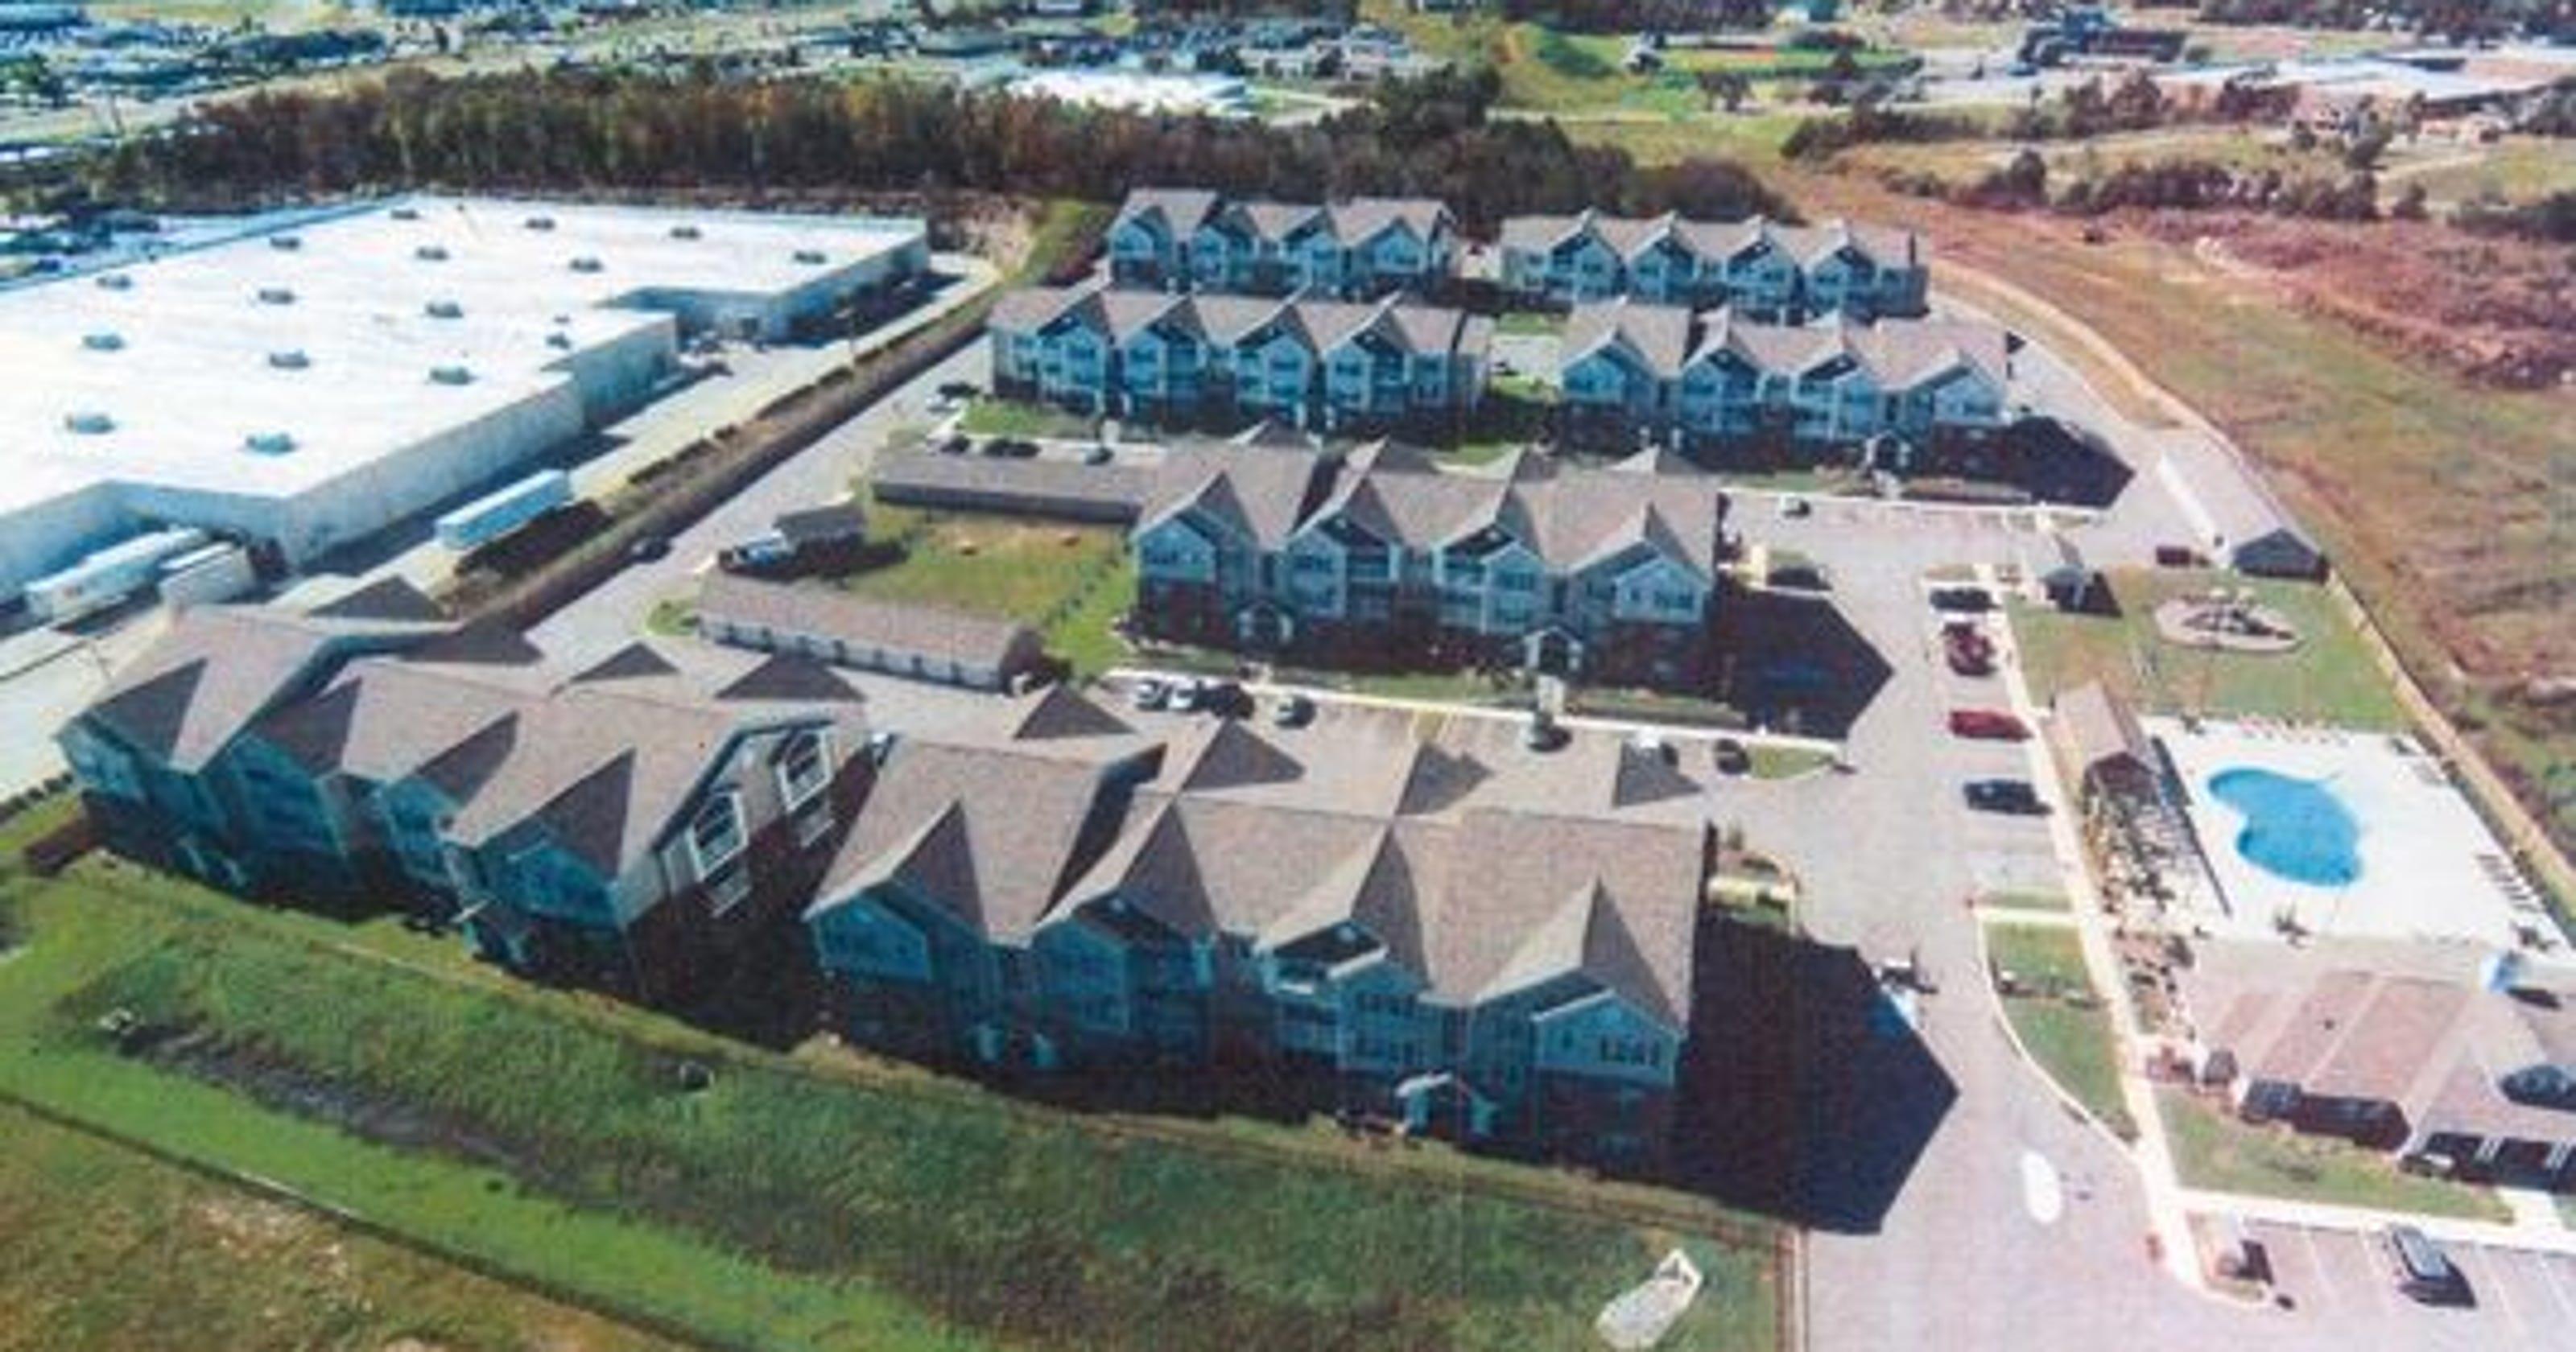 Rezone OK'd for new Ashland City apartments